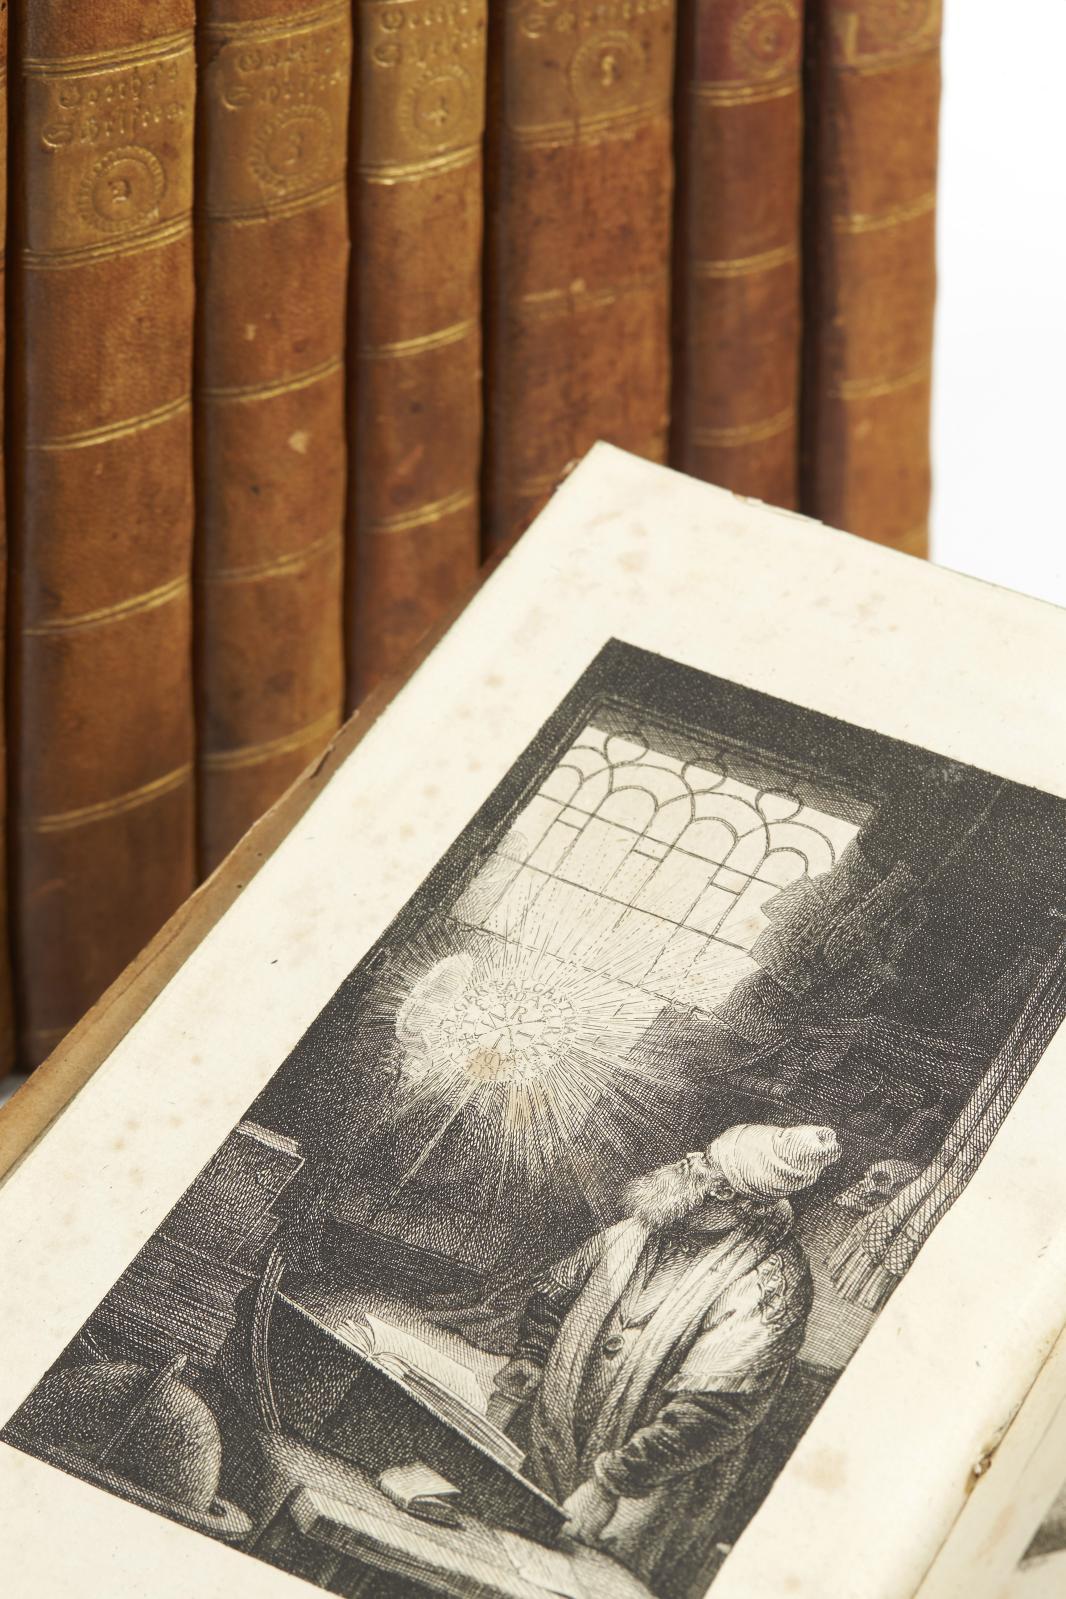 Johann Wolfgang von Goethe (1749-1832), Goethe's Schriften, Leipzig, Georg Joachim Göschen, 1787-1790, 8 volumes petit in-8° : demi-veau fauve à coins